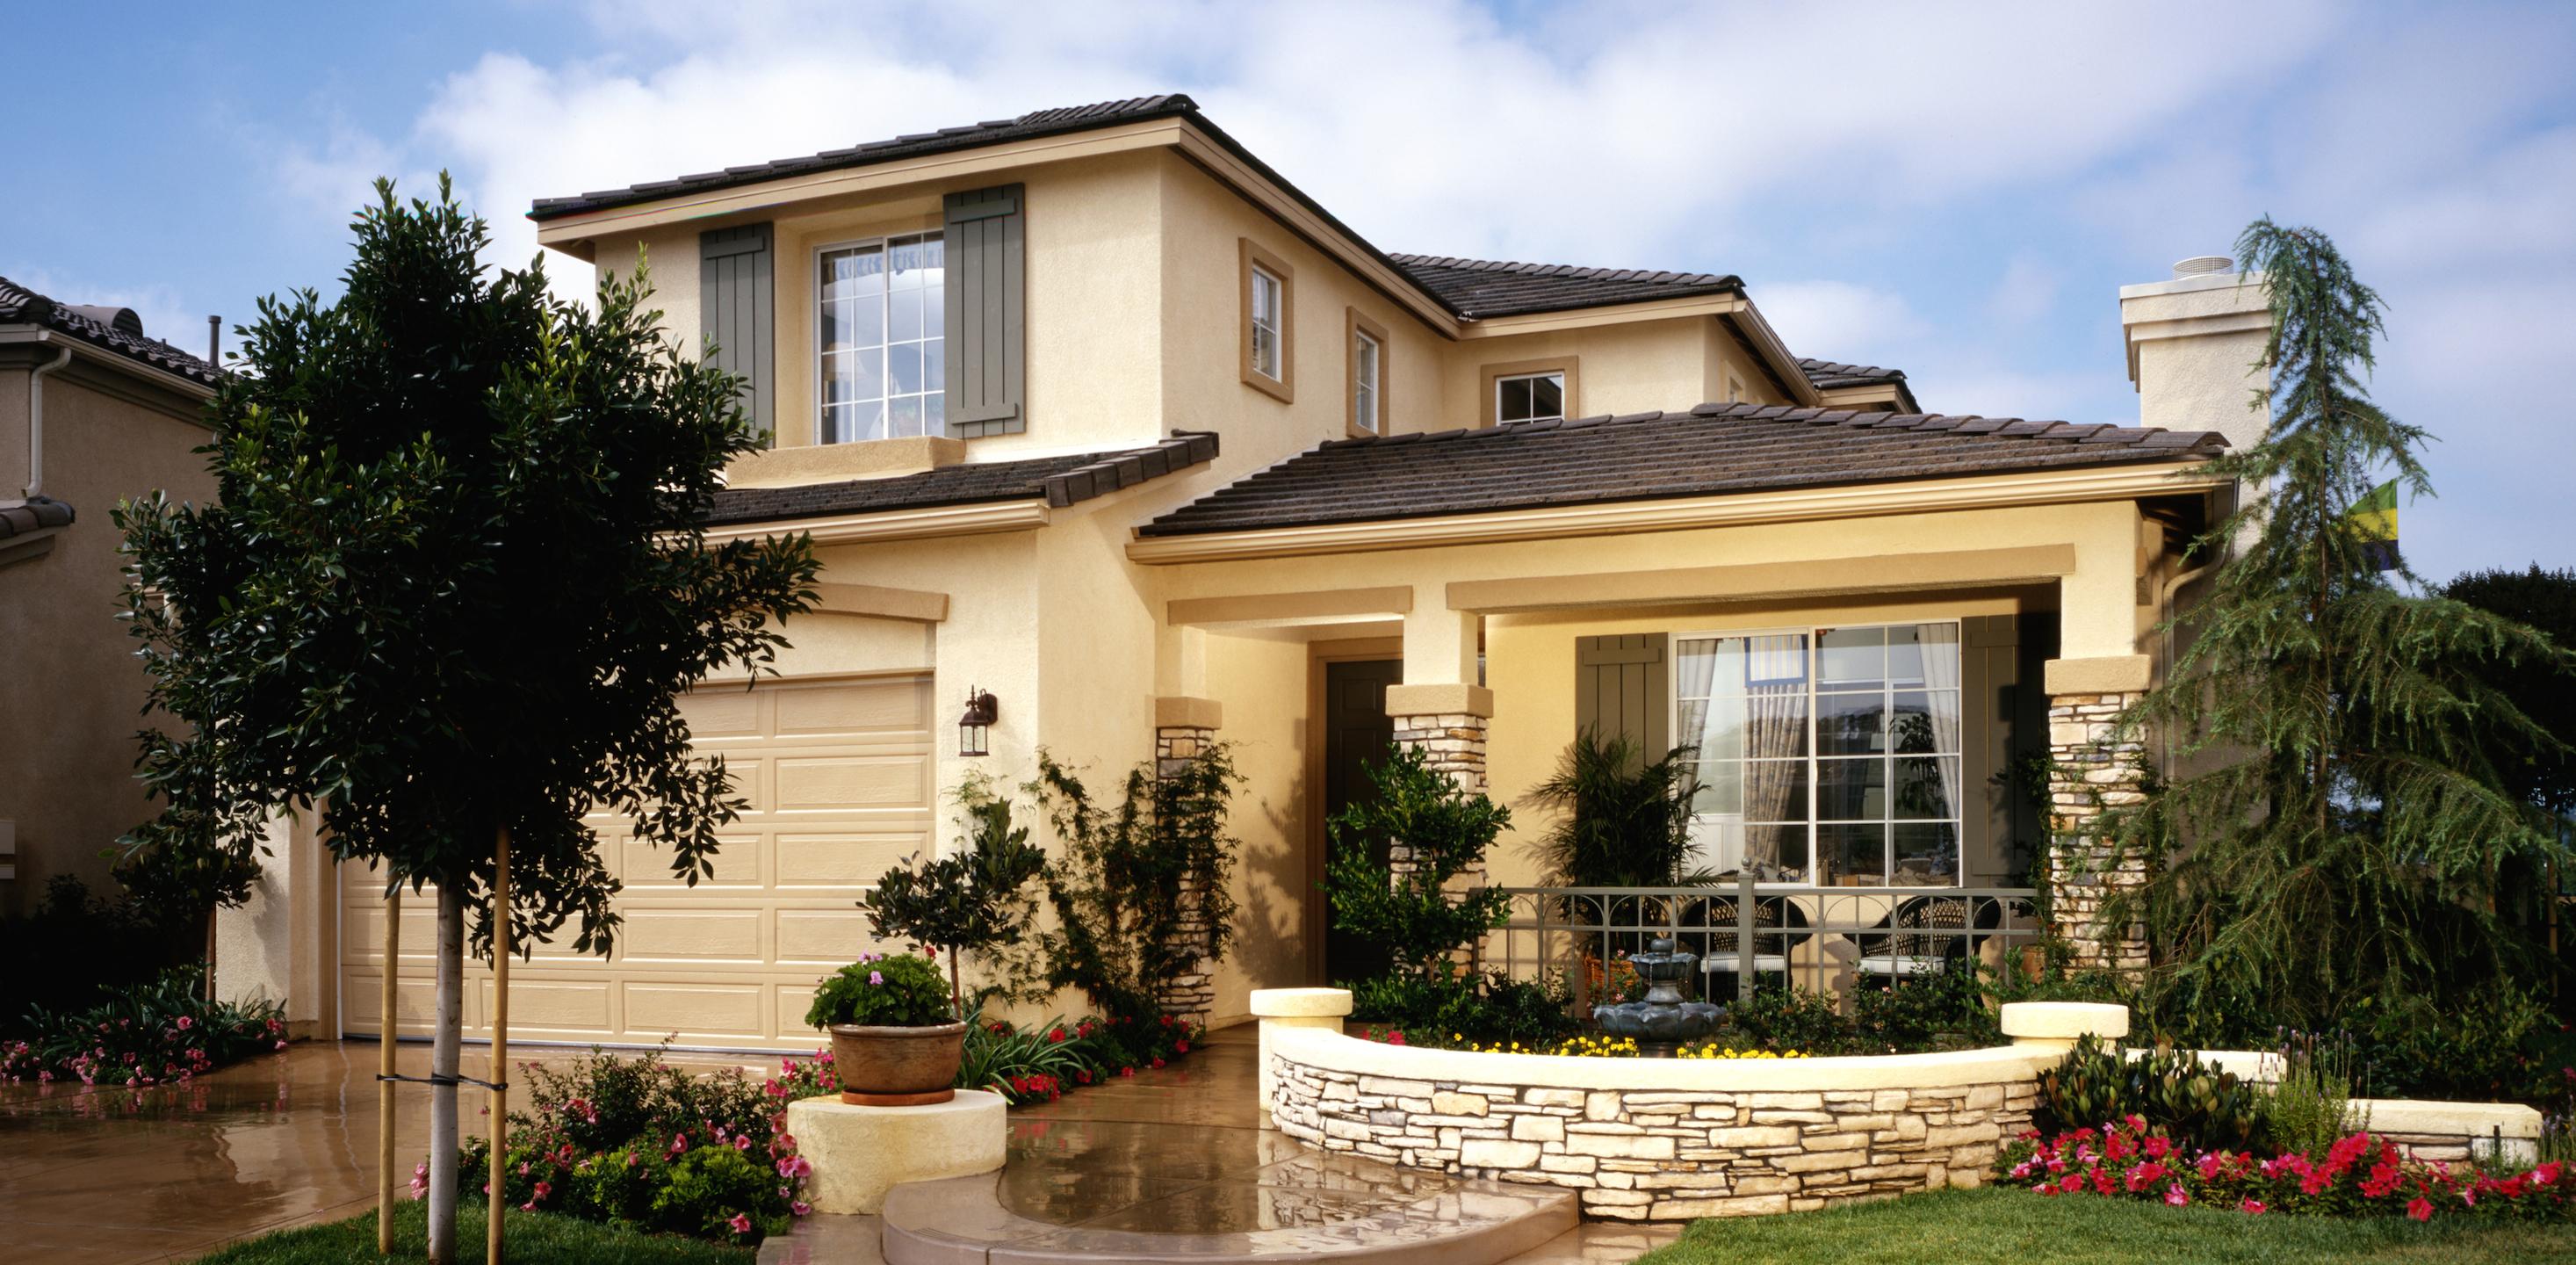 Watauga Real Estate - Search all Watauga Homes & Condos for Sale